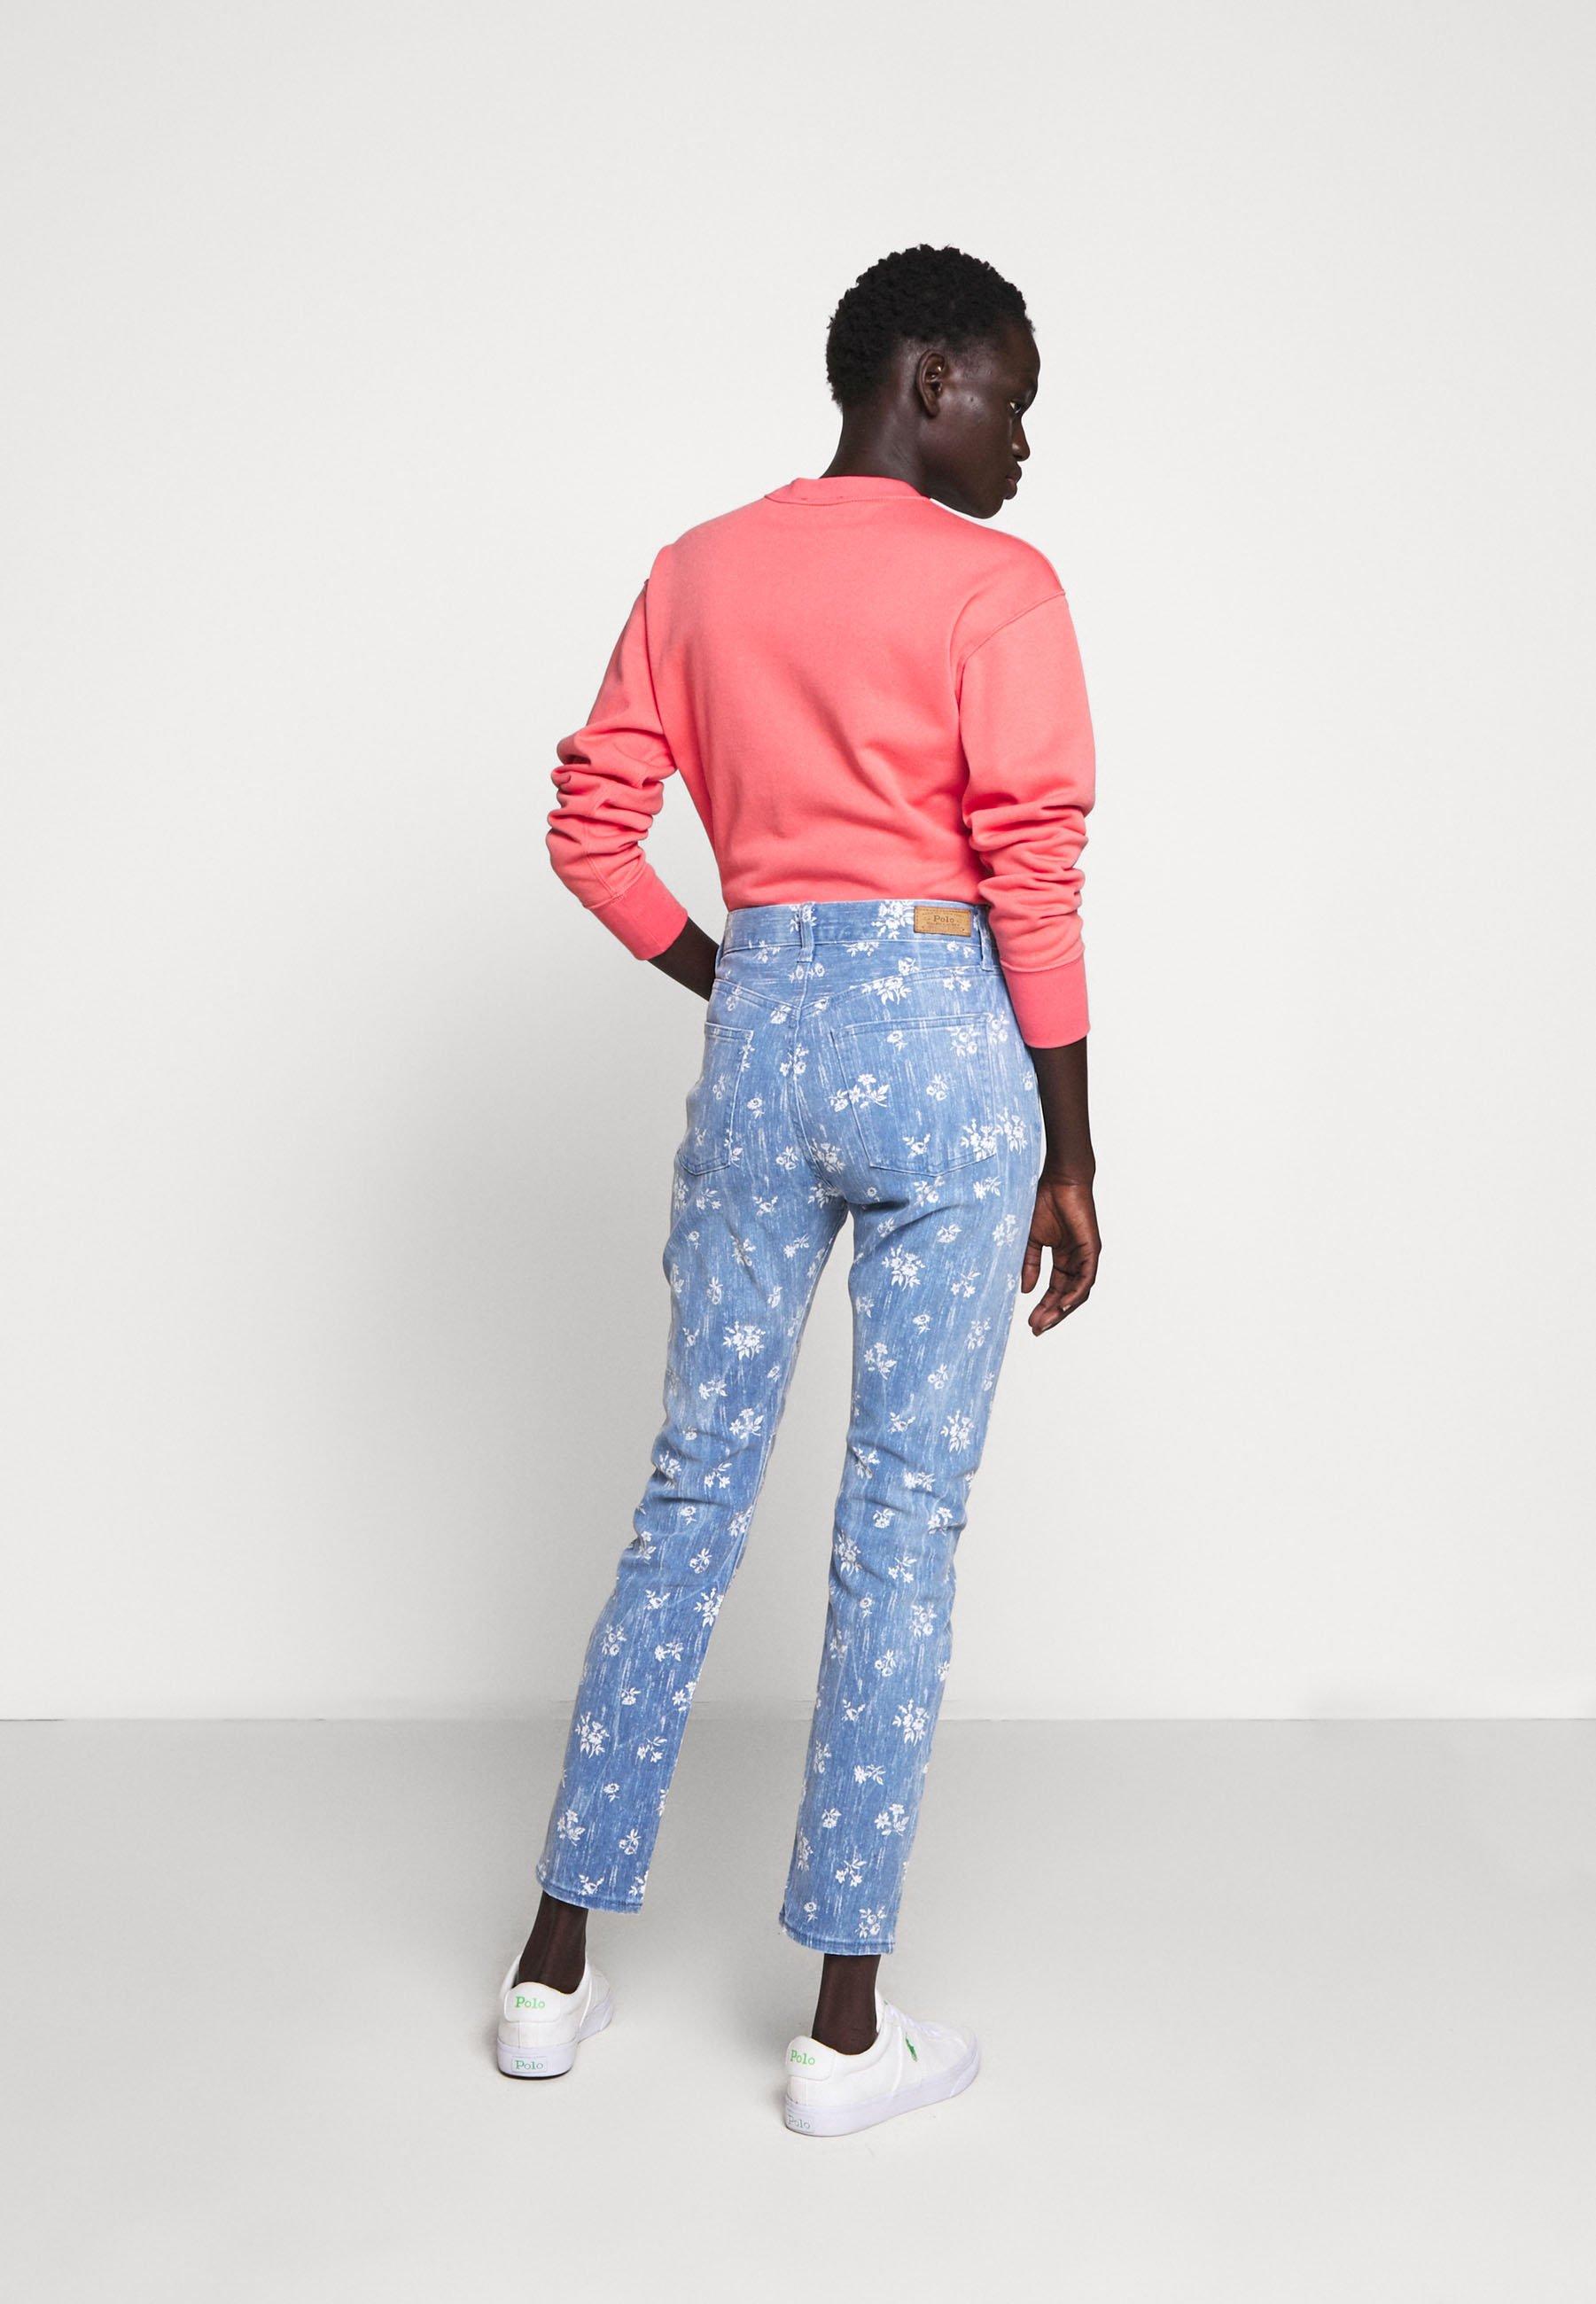 Polo Ralph Lauren ALYSON WASH - Jeans Skinny - blue denim - Jeans Femme UZFpE